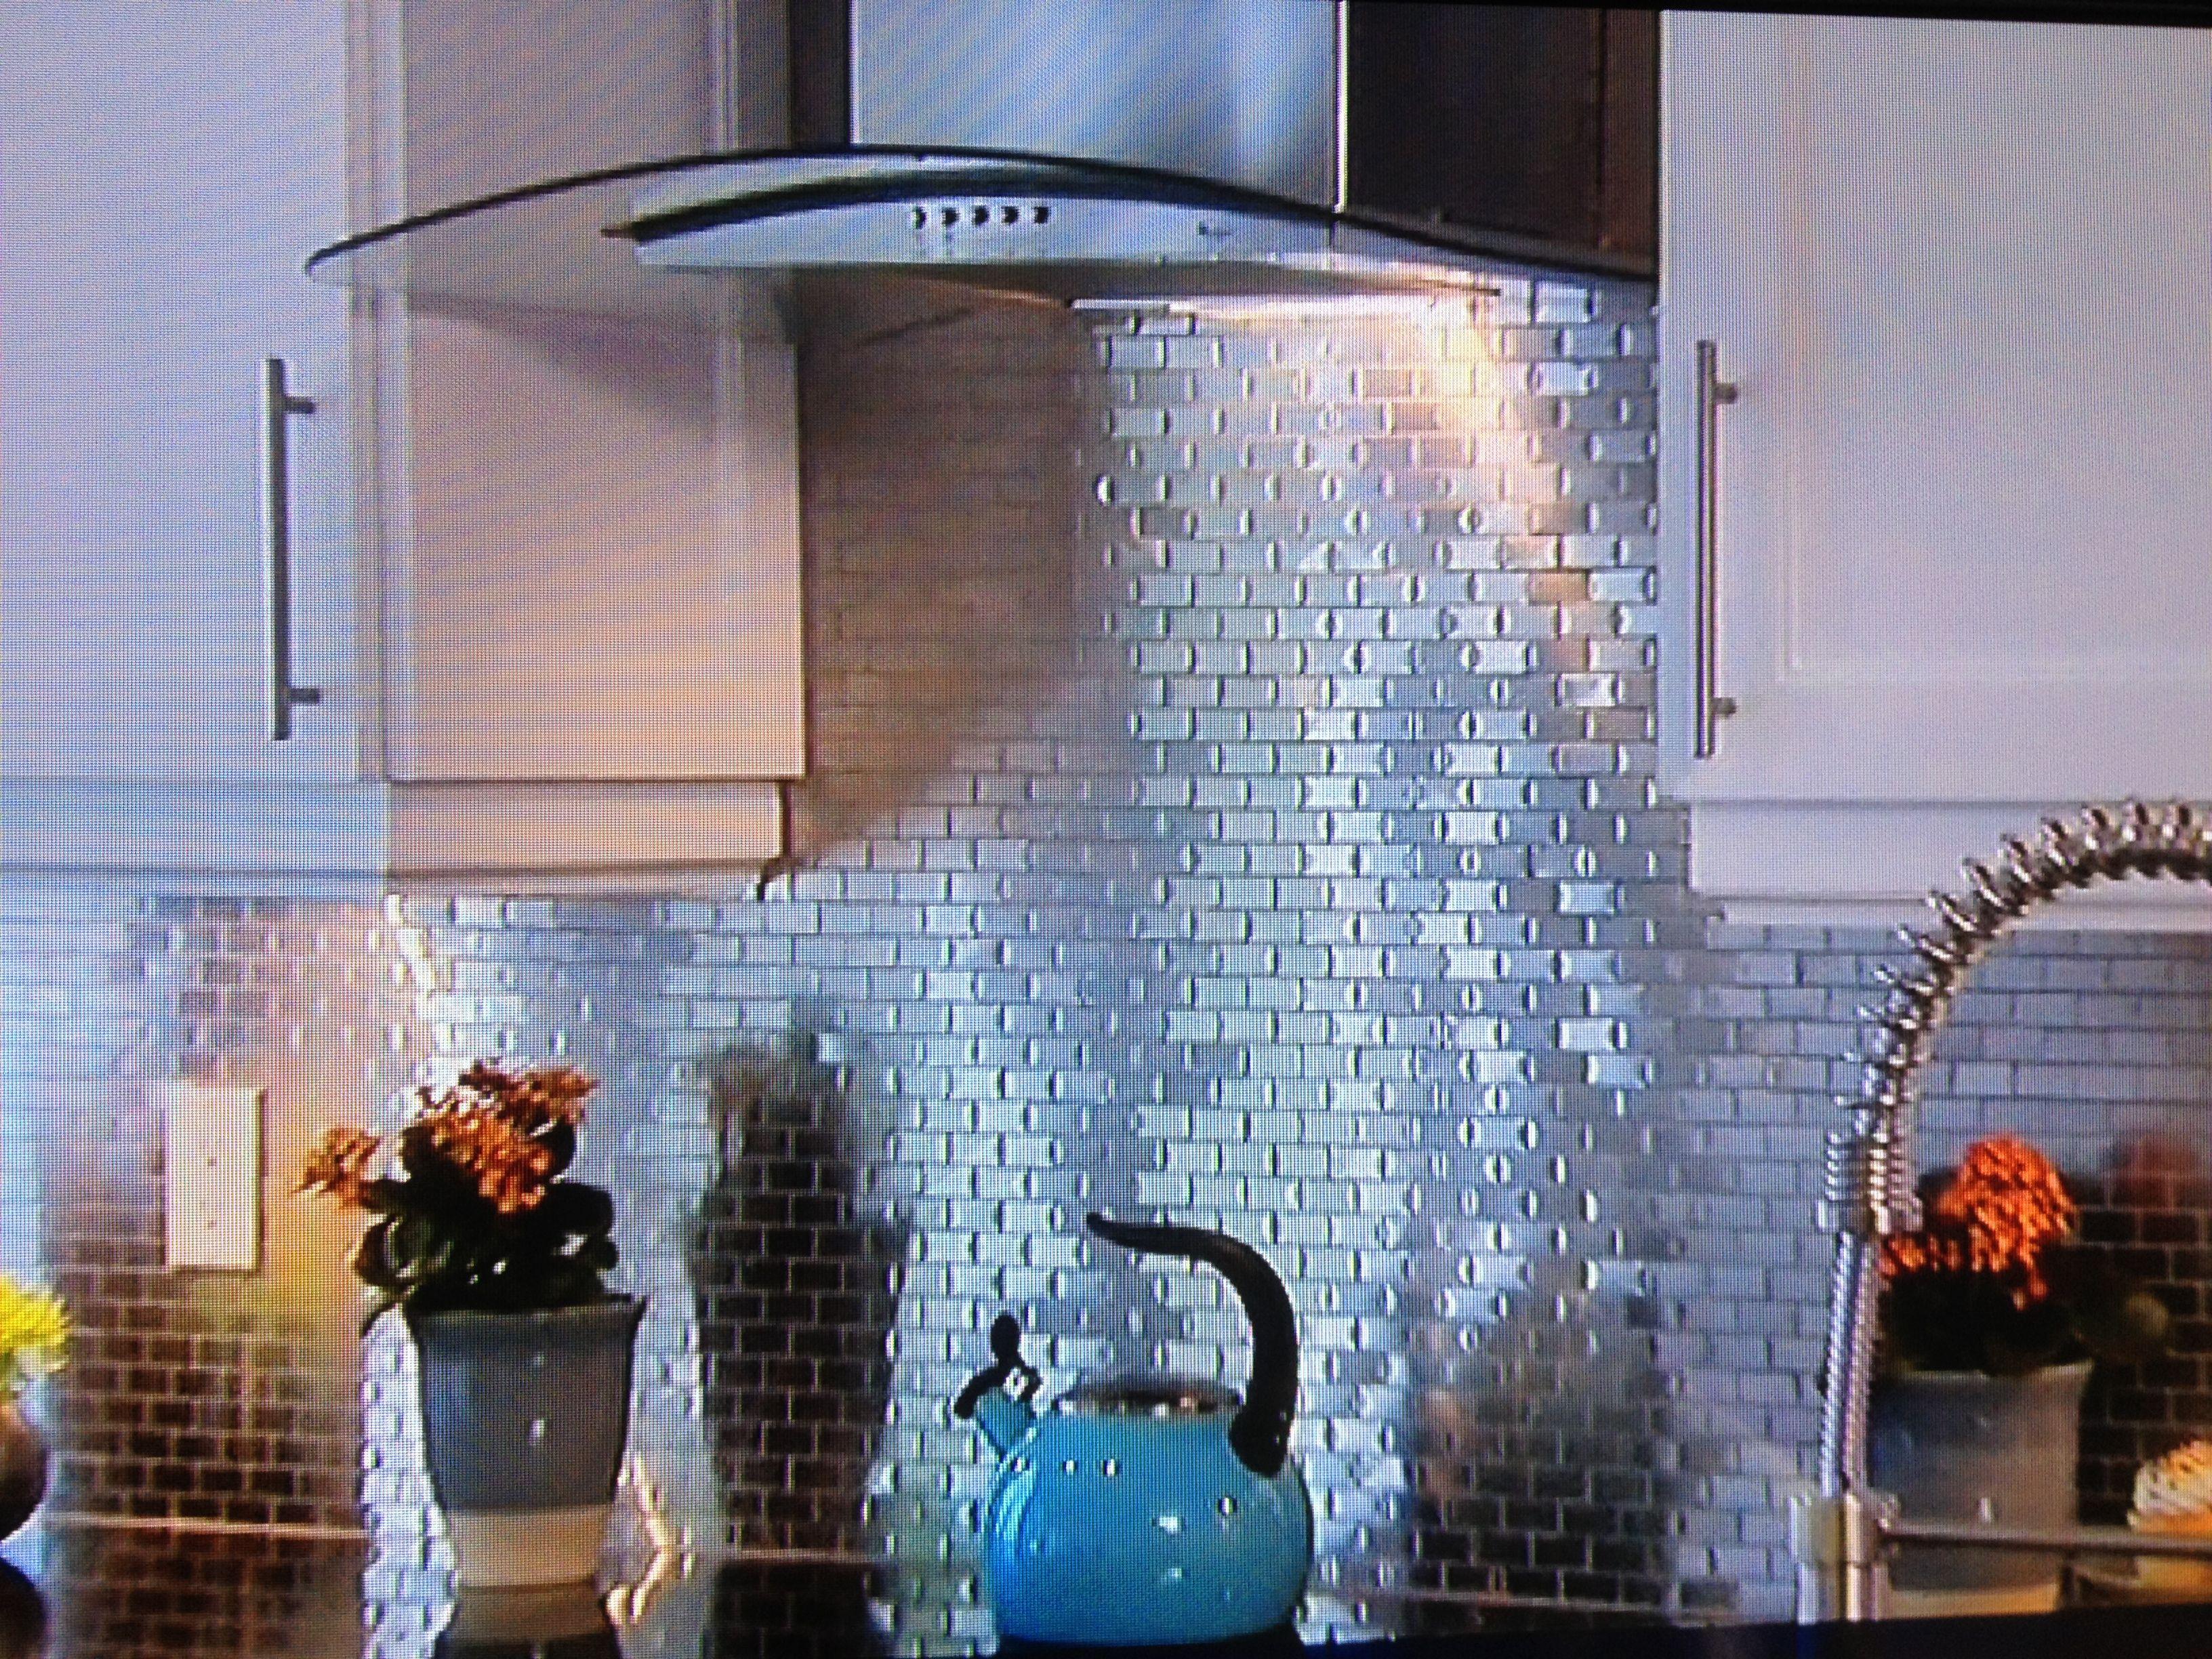 tin backsplash tiles | Tin Backsplash Property Brothers - Decorative ...